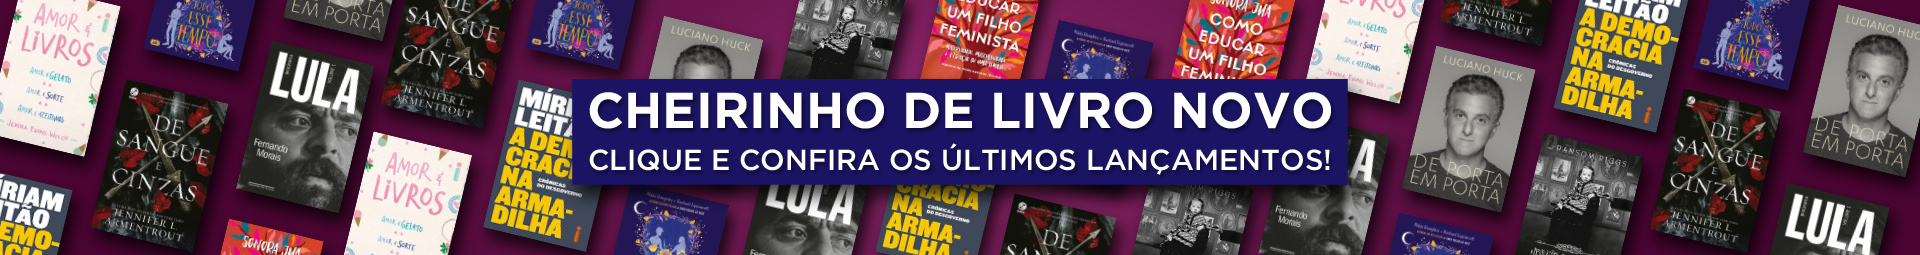 Livros - Banner Desktop